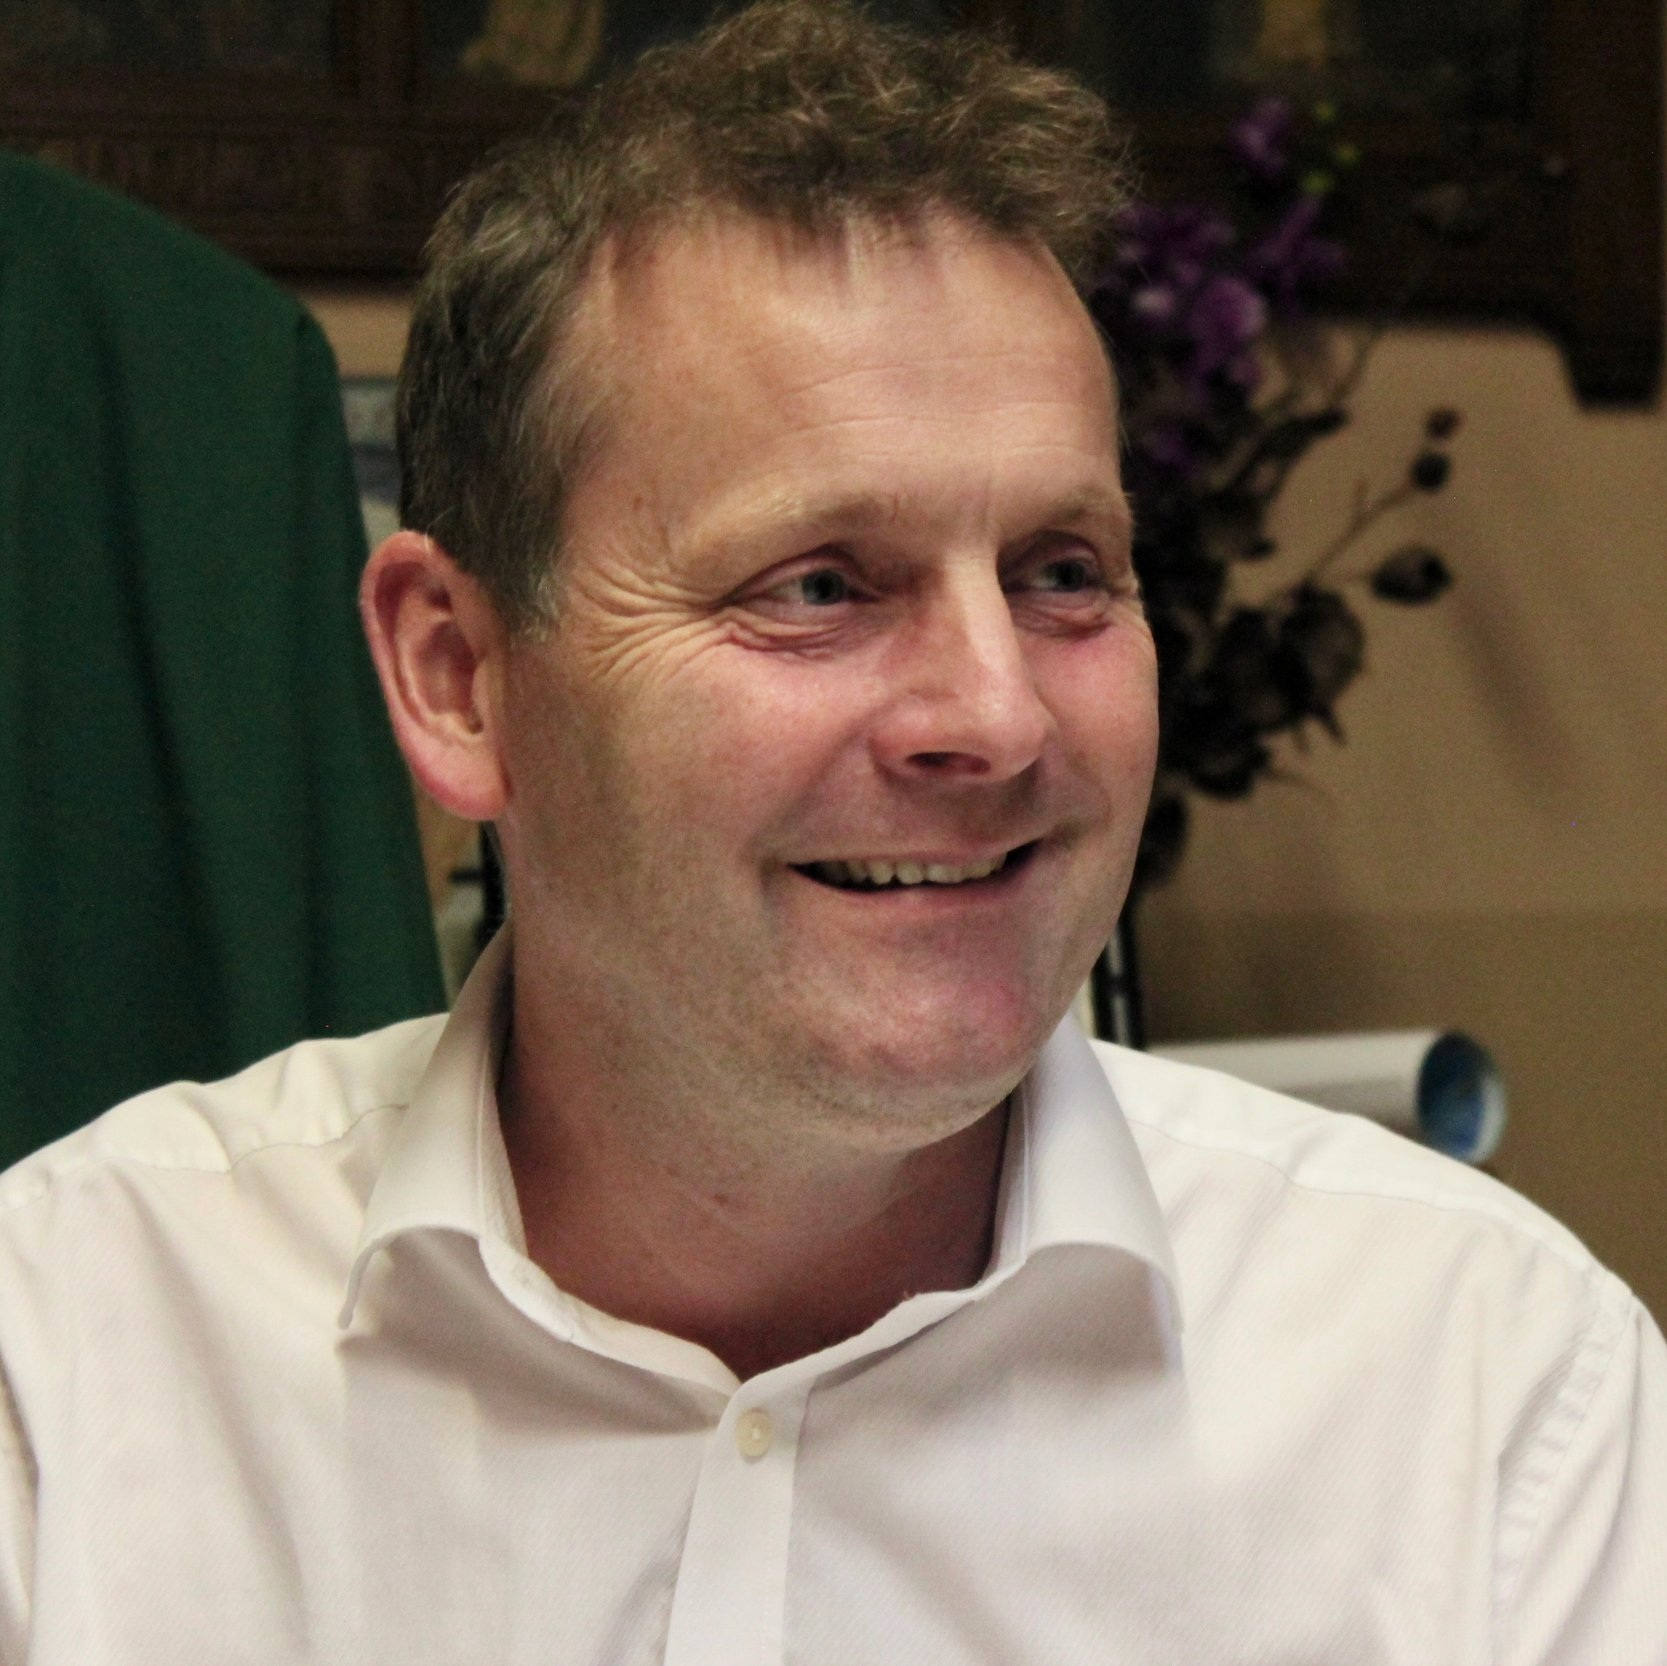 Jack McDonald